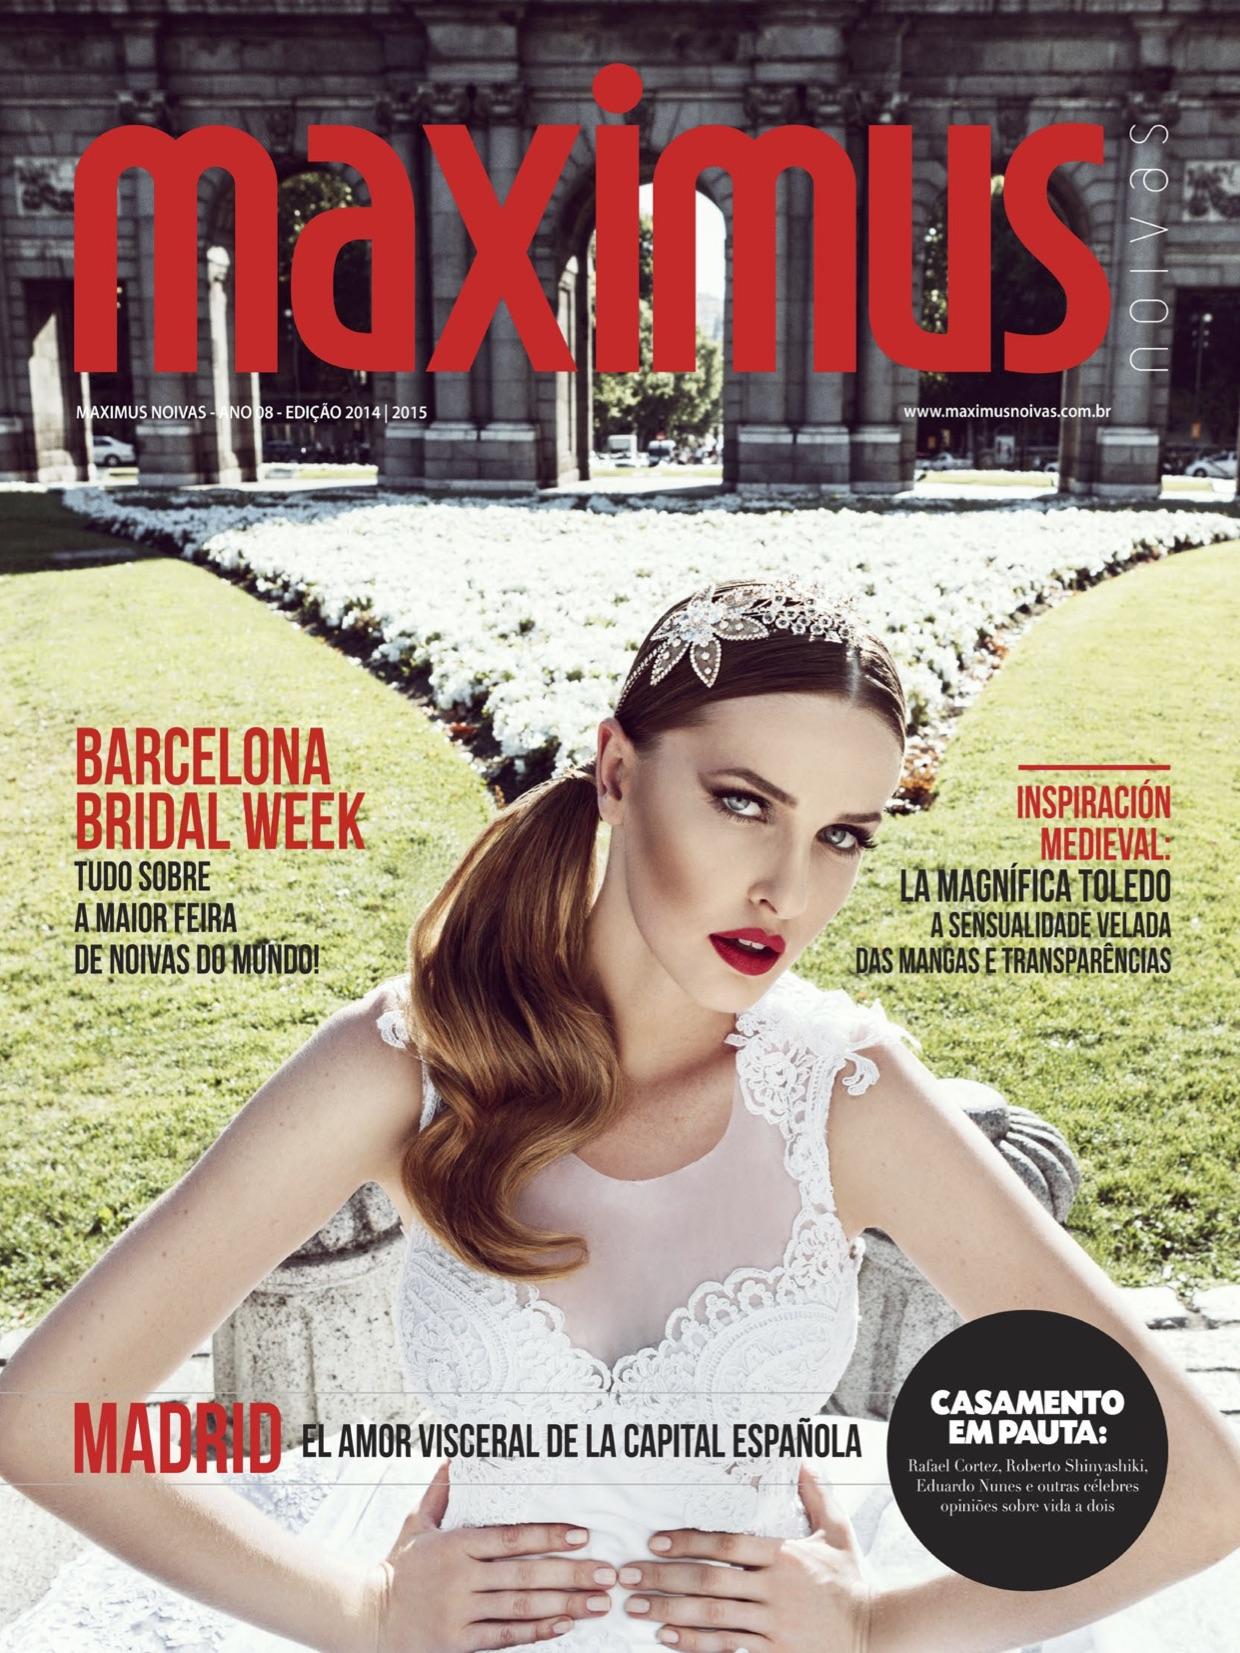 Maximus Noivas 2014.jpg